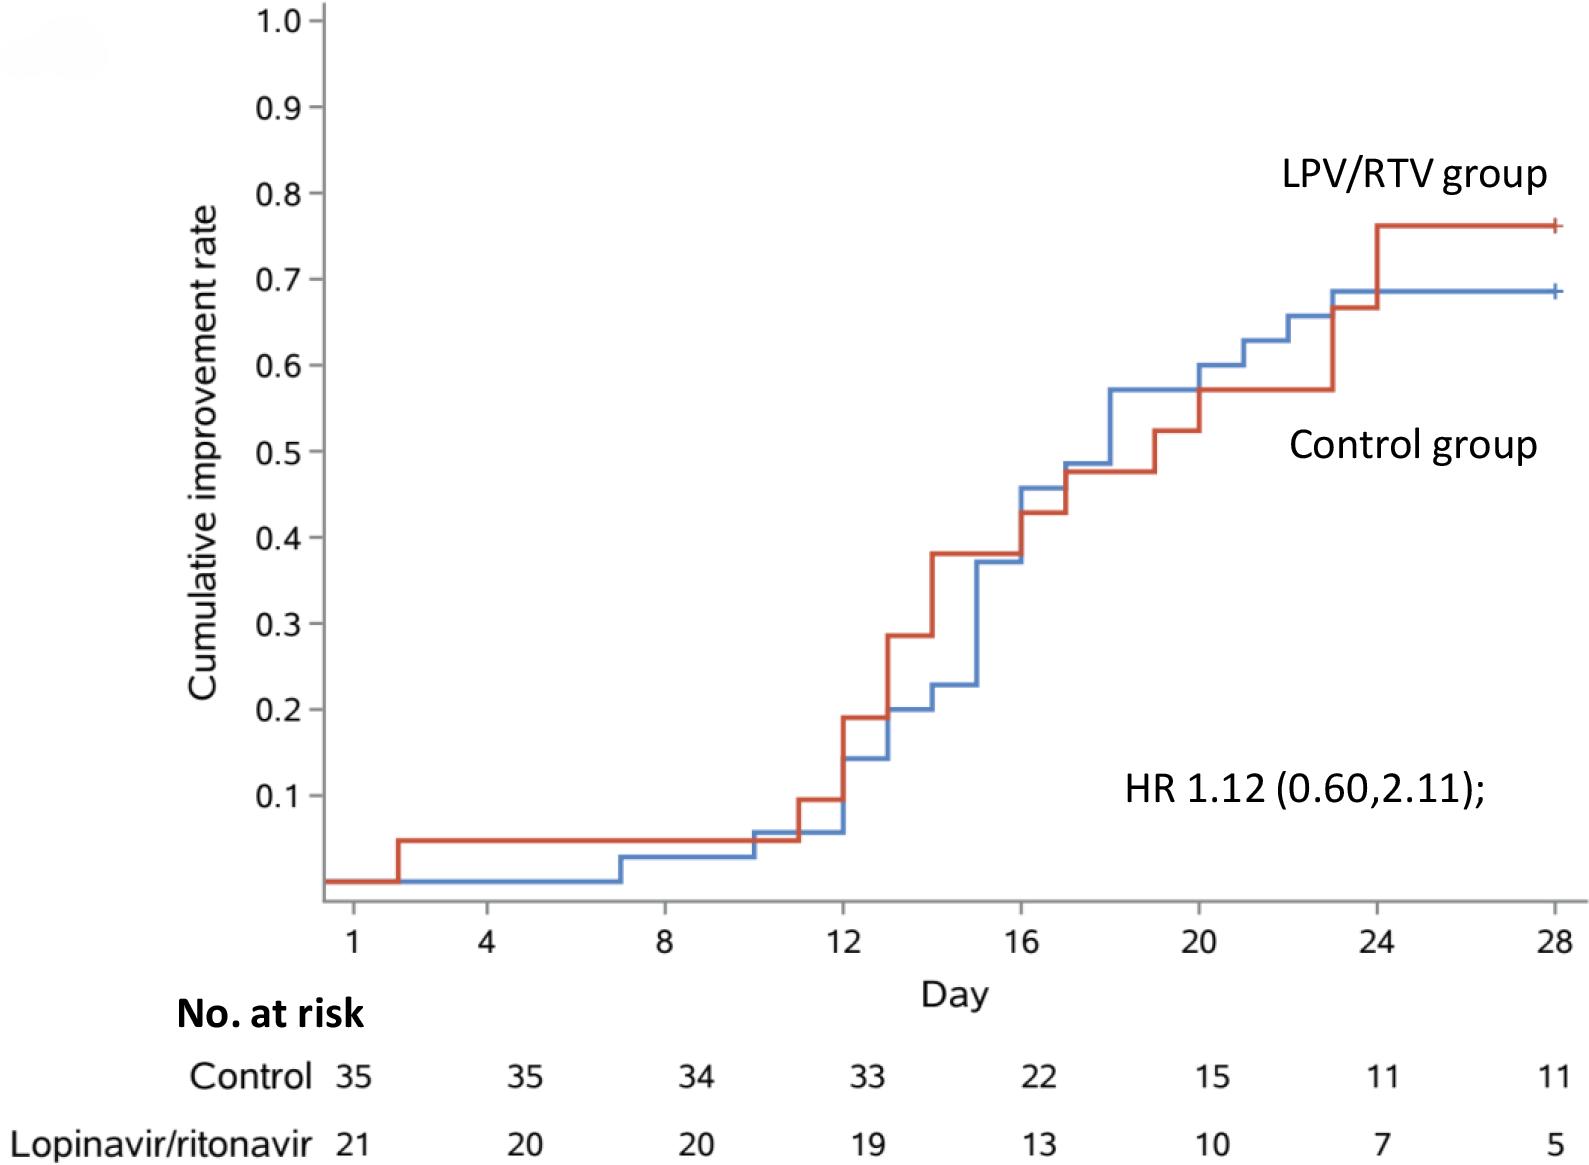 chictr2000029308 results 07 - Коронавирус. Лекарства. Лопинавир и ритонавир не помогли в лечении COVID-19